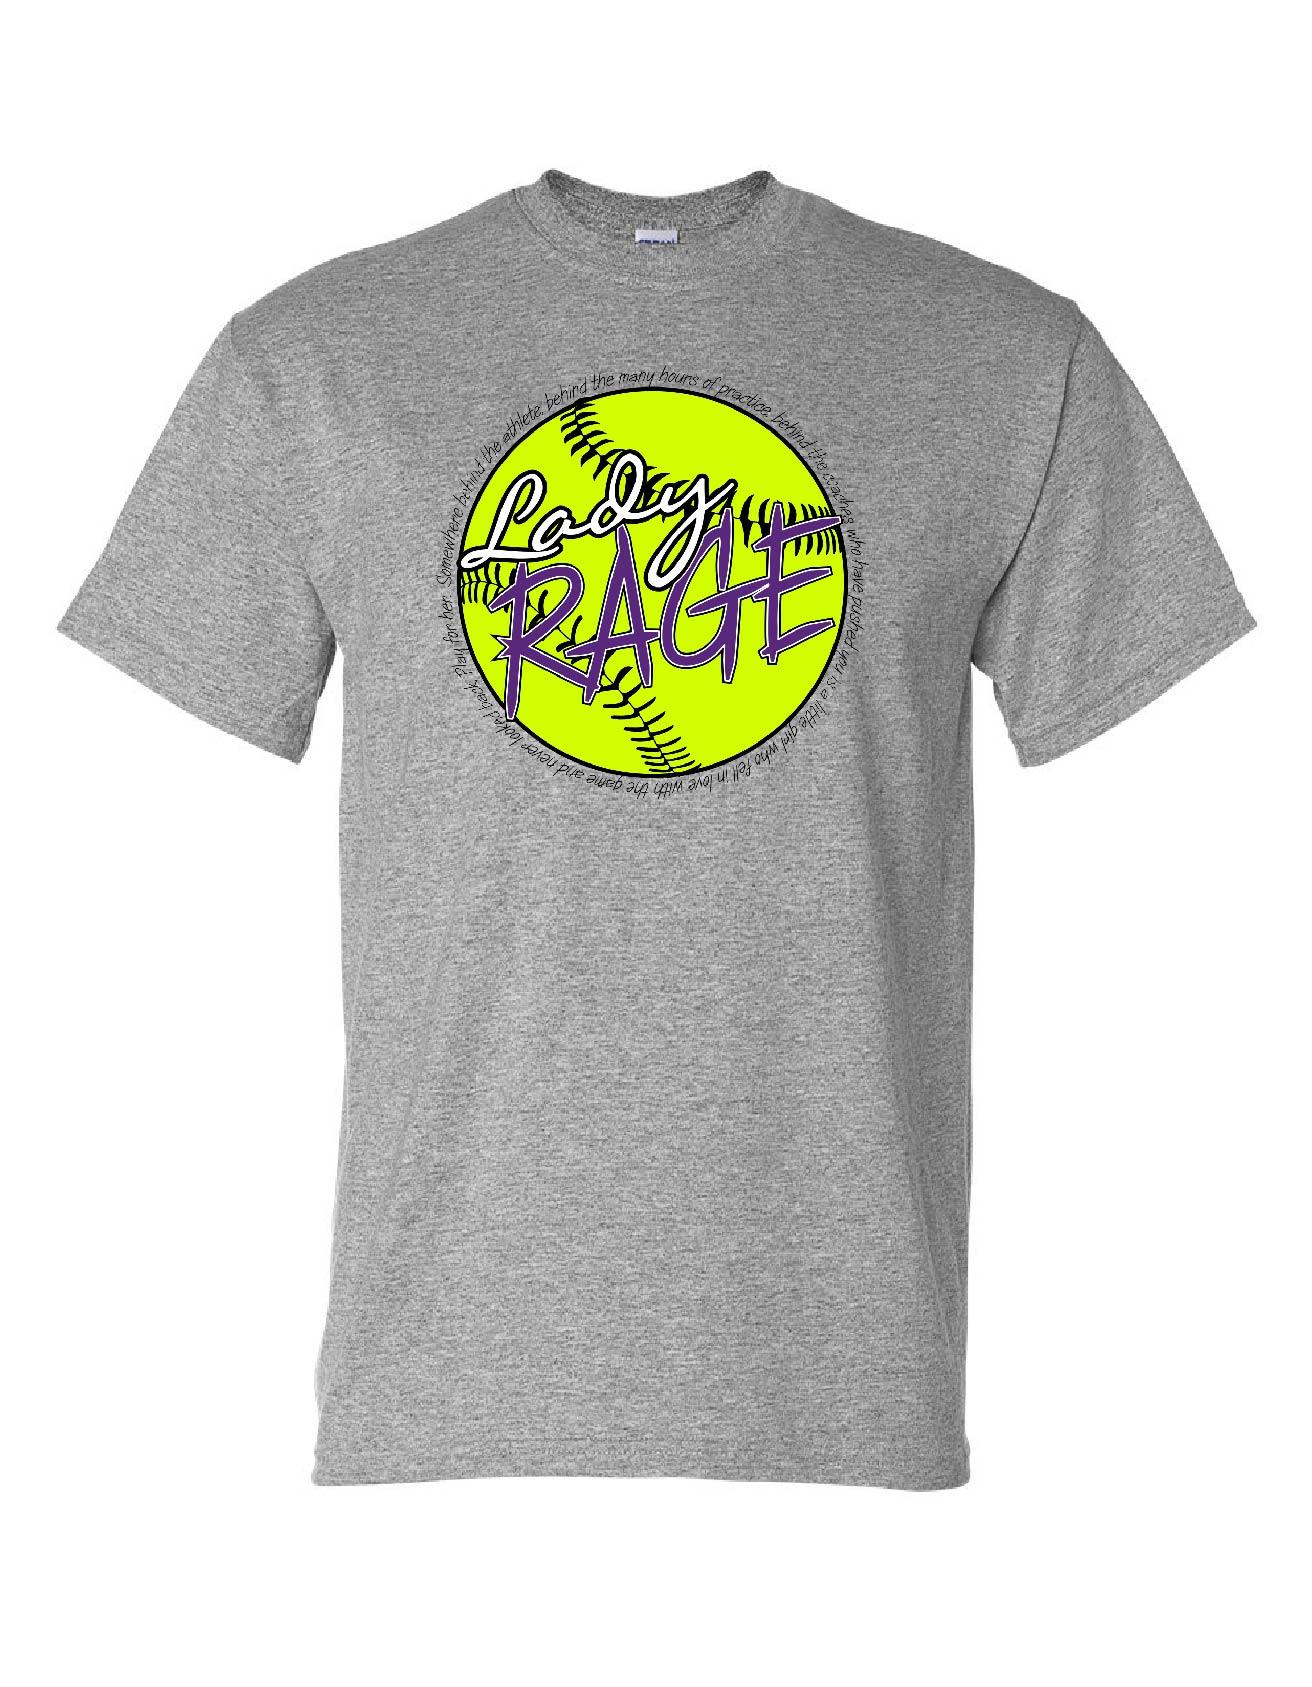 lady rage sports grey tee adrenaline apparel design. Black Bedroom Furniture Sets. Home Design Ideas